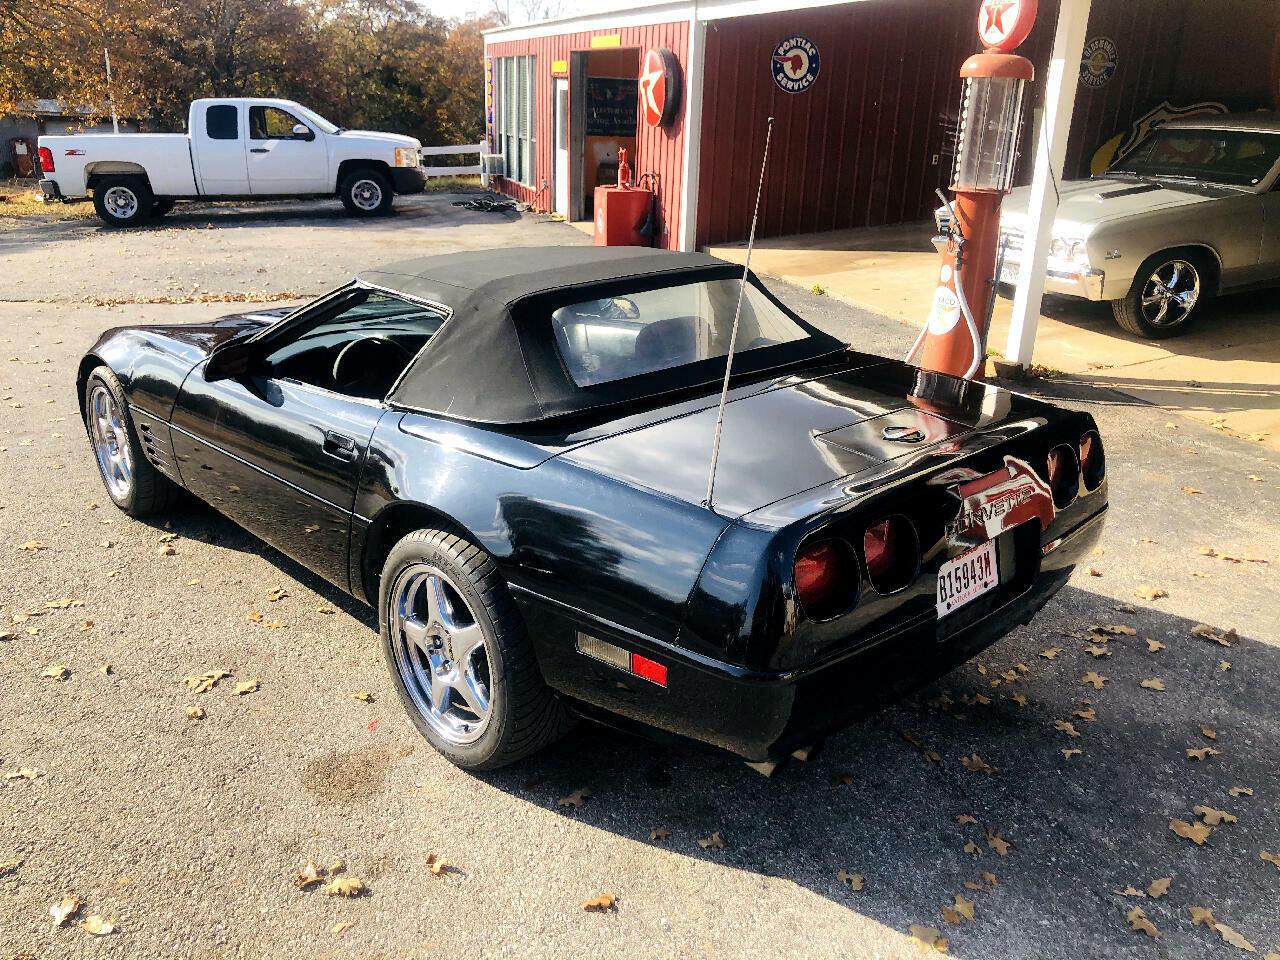 1991 Black Chevrolet Corvette Convertible  | C4 Corvette Photo 3